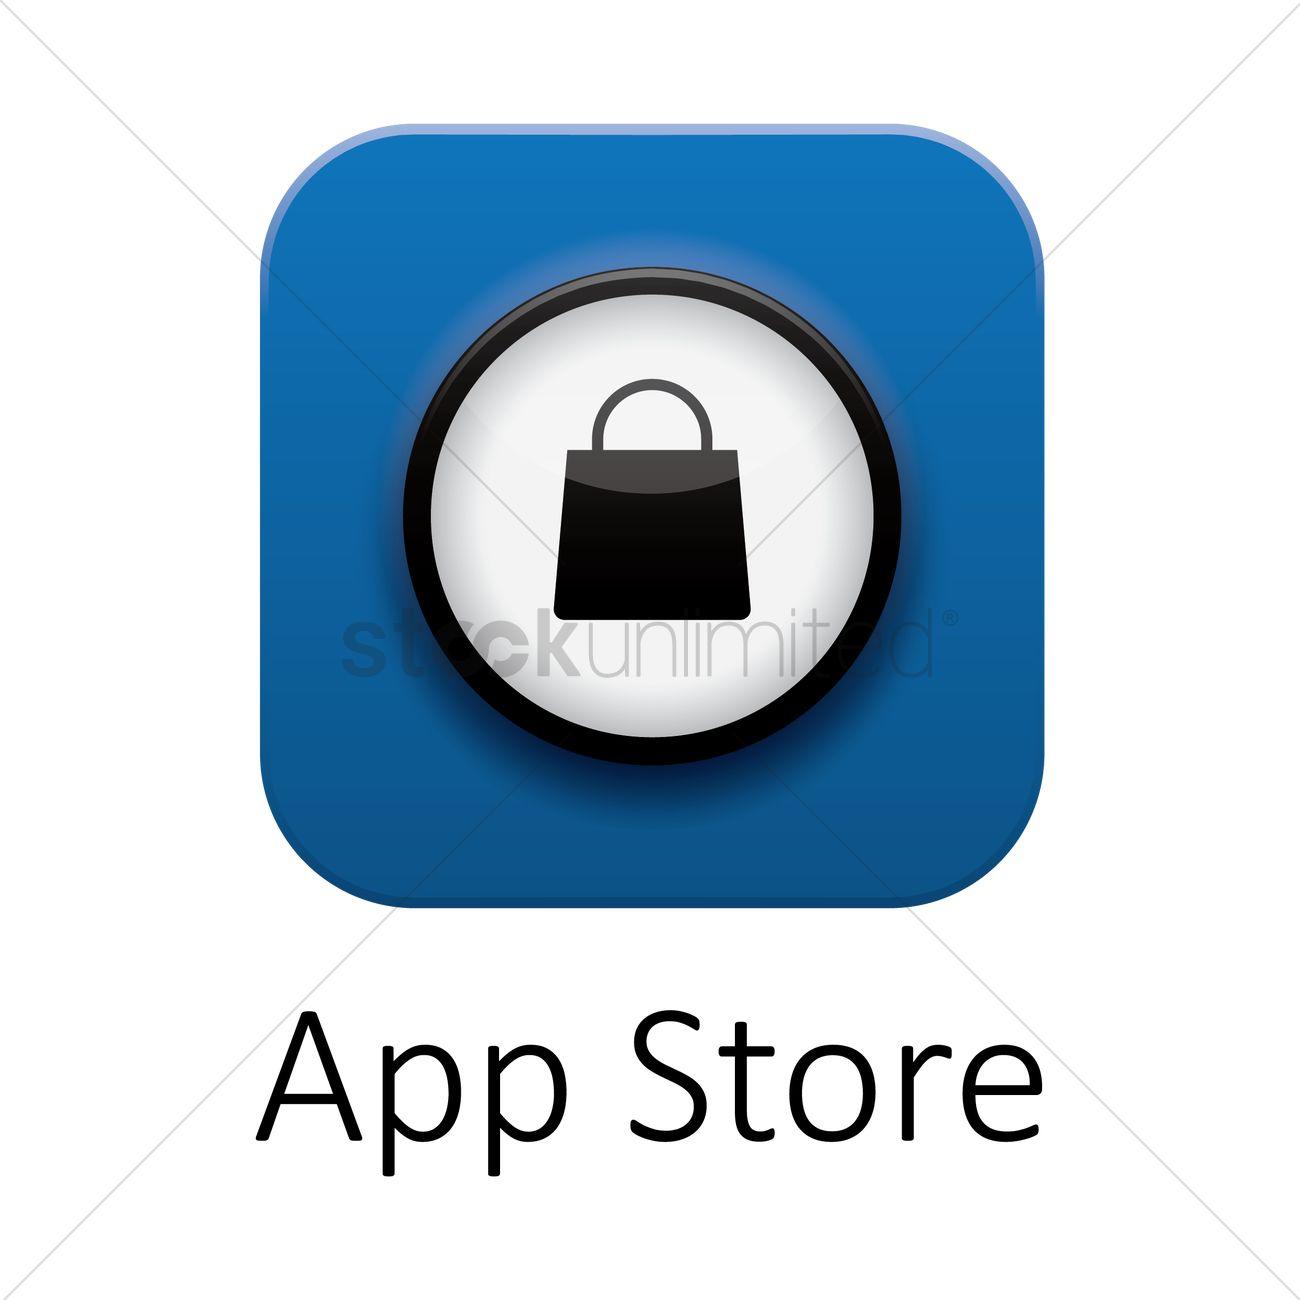 1300x1300 App Store Icon Vector Image